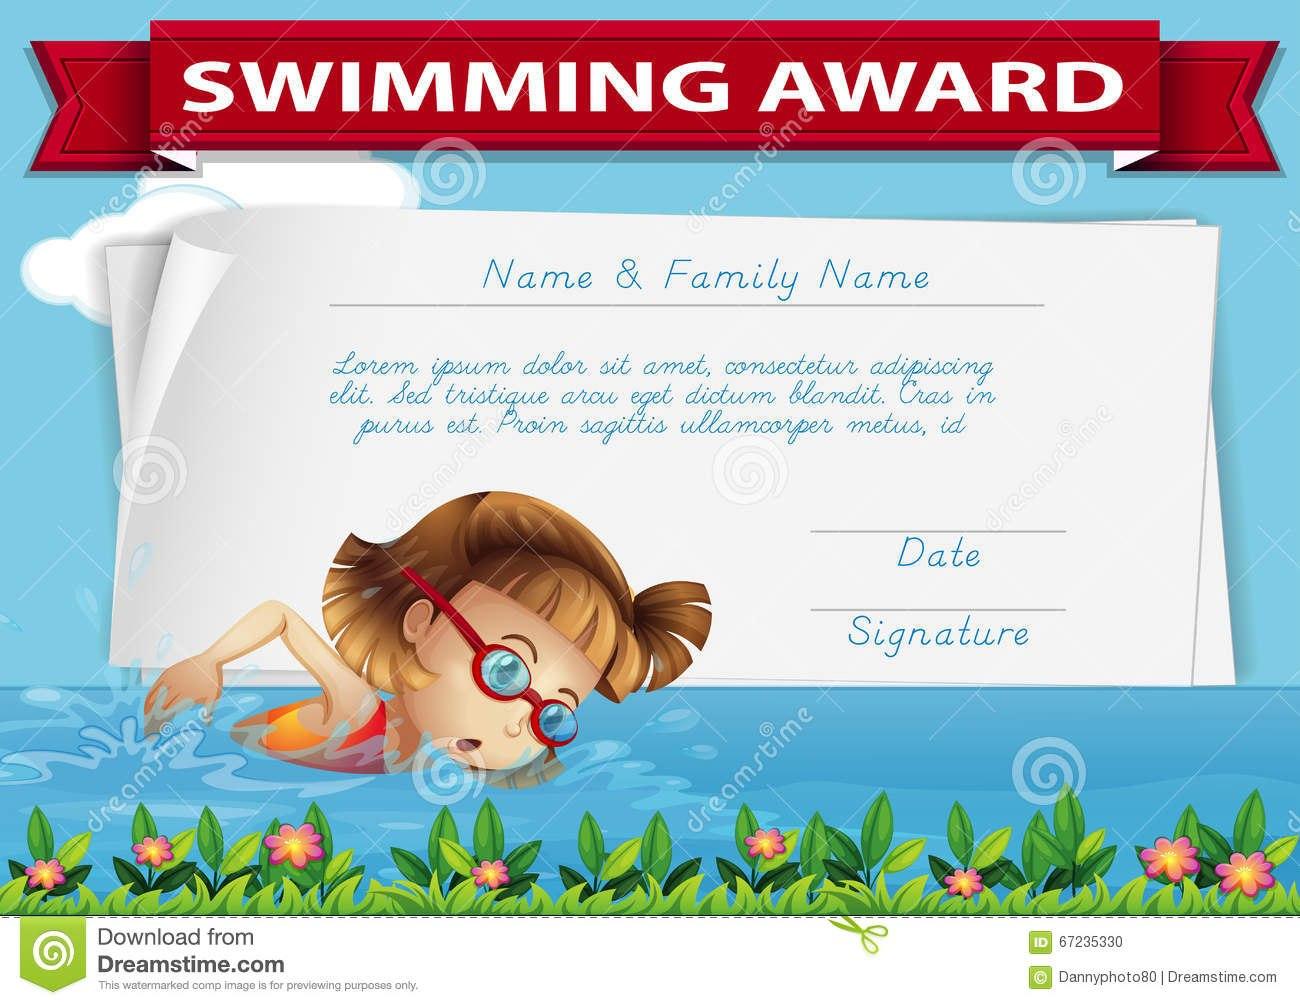 Swimming Award Certificate Template Stock Illustration Inside Swimming Certificate Templates Free